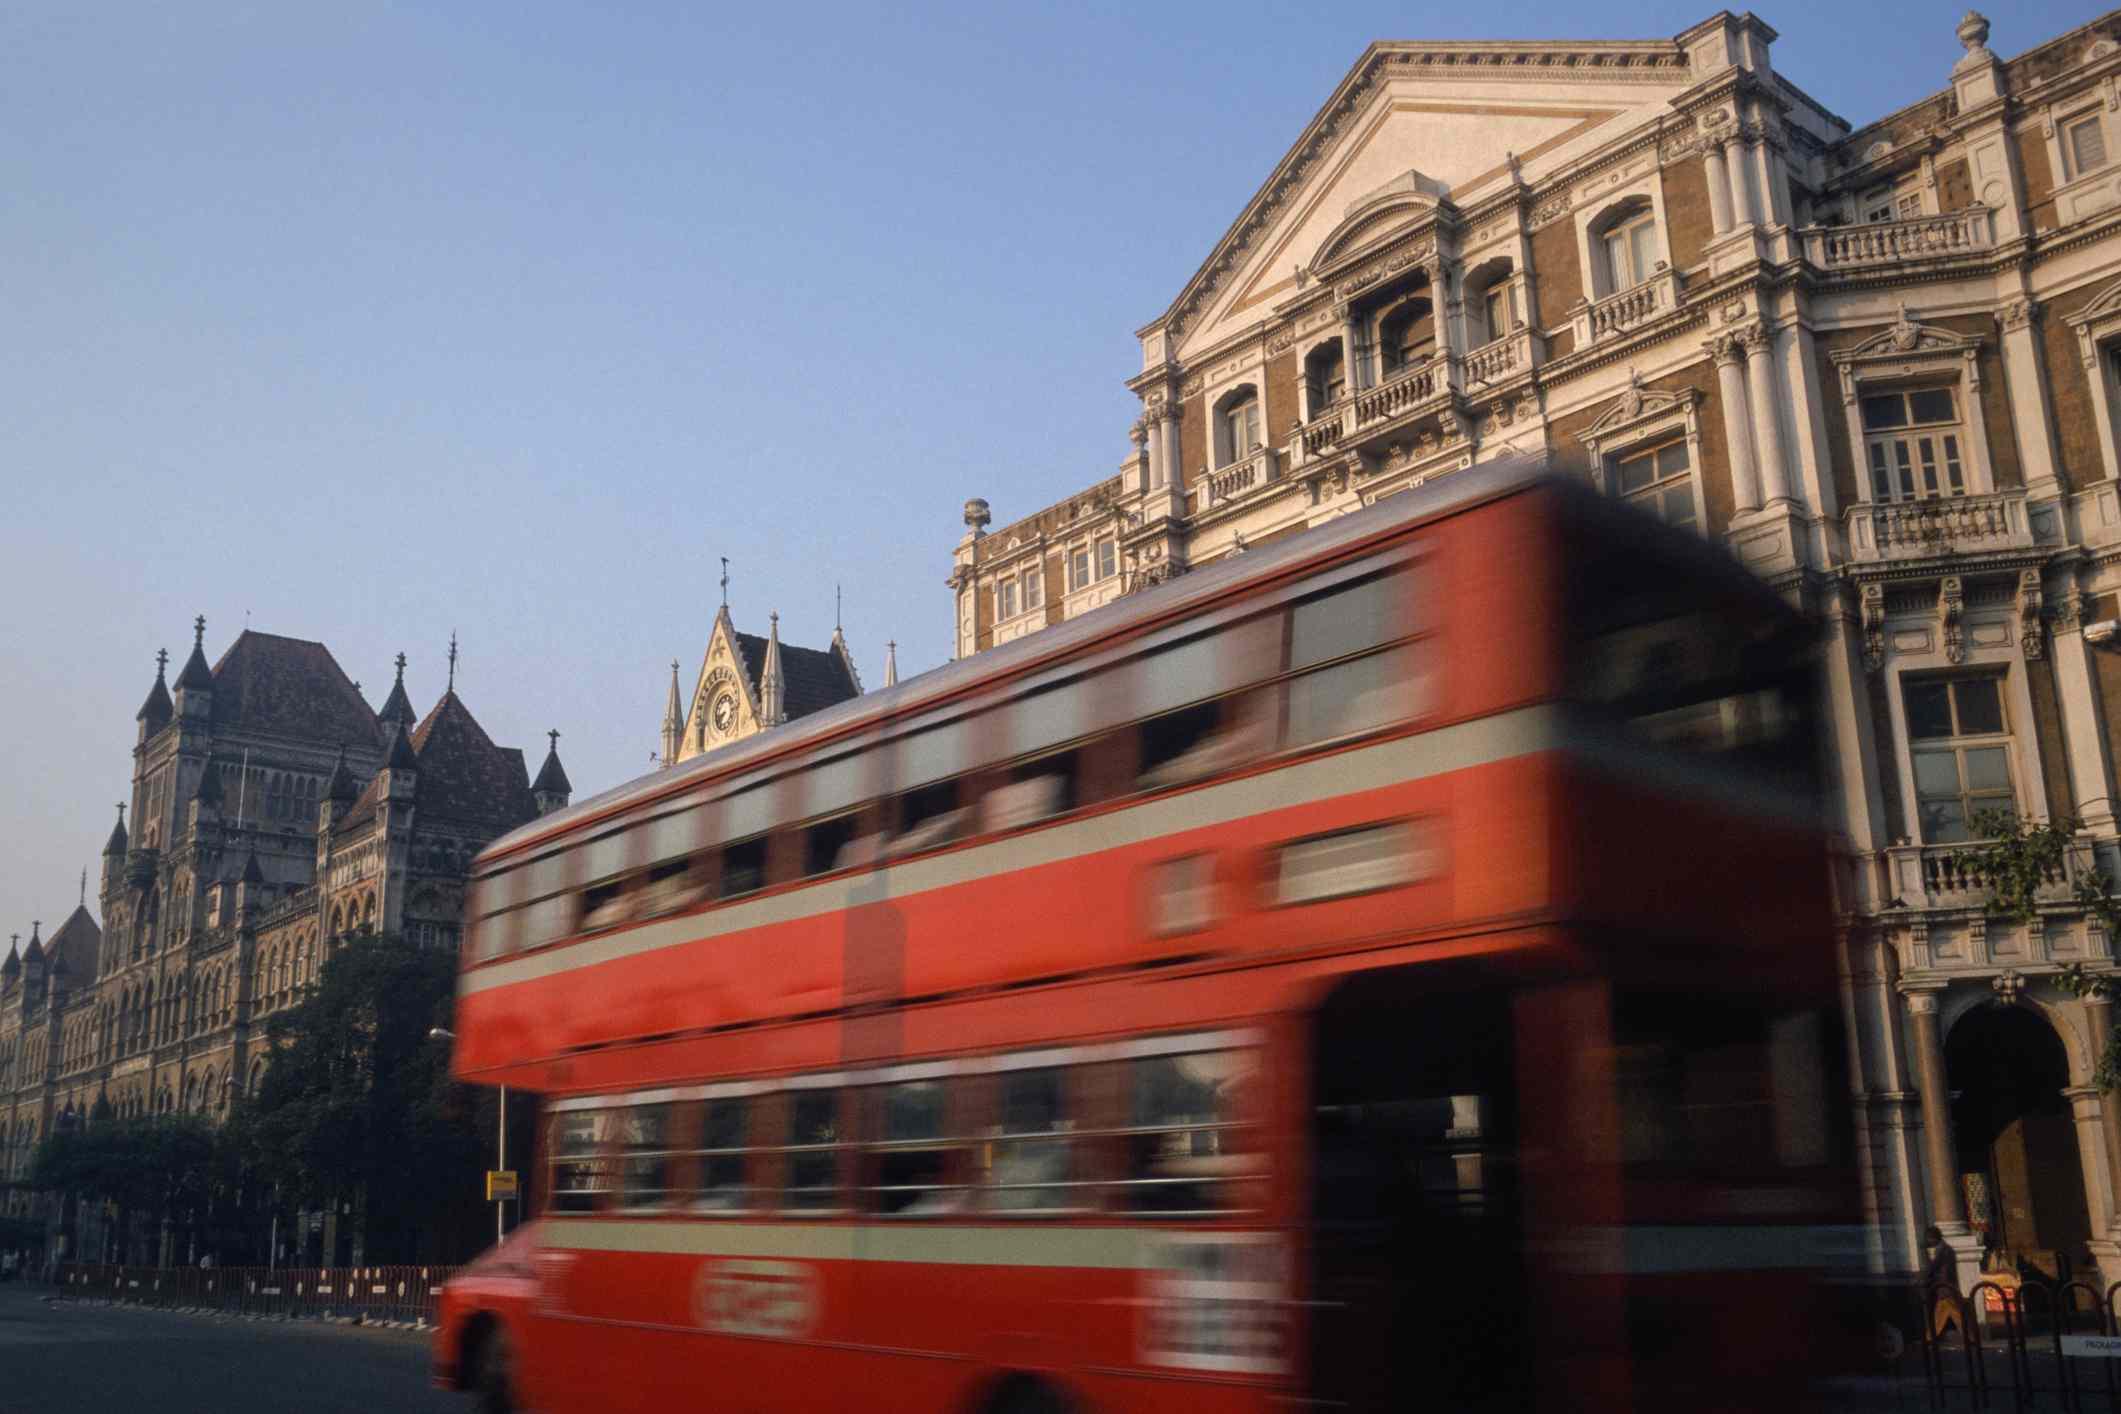 Double decker bus in Mumbai.